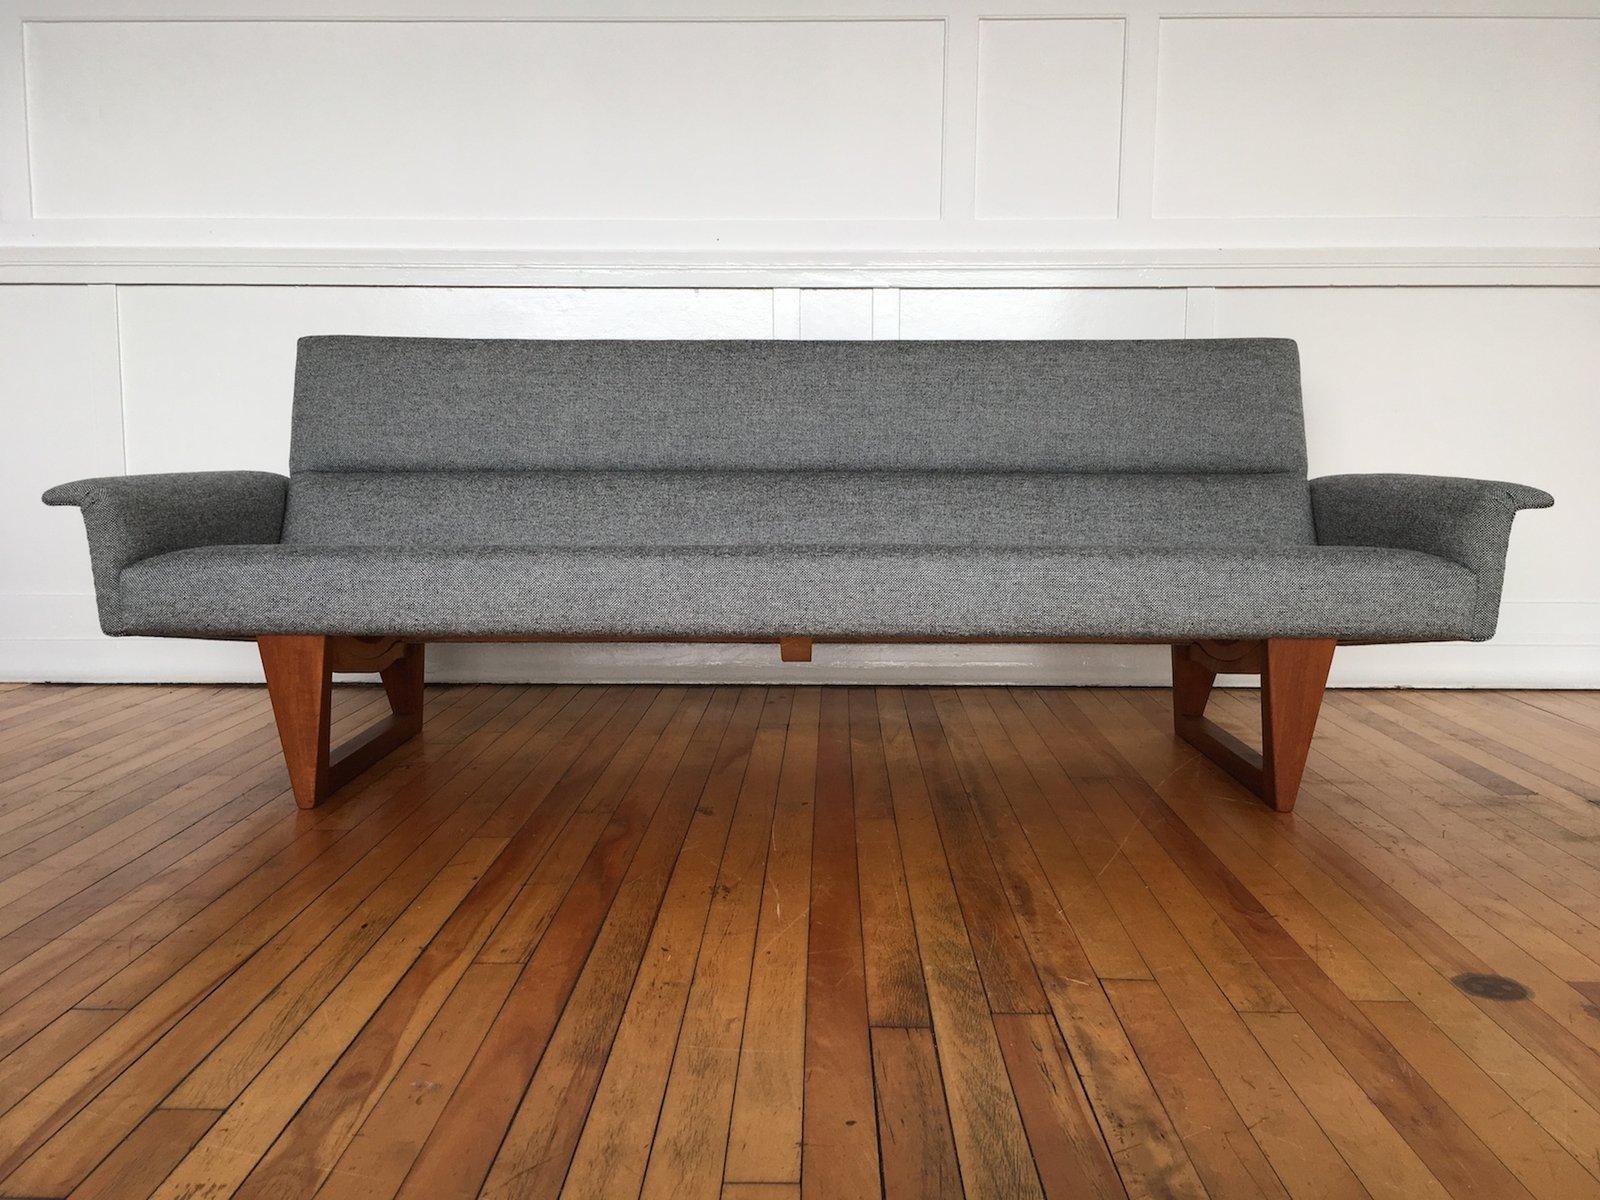 gallery of midcentury danish hm sofa by illum wikkelso for hjorring mobel u s with sofa mbel - Sofa Mbel